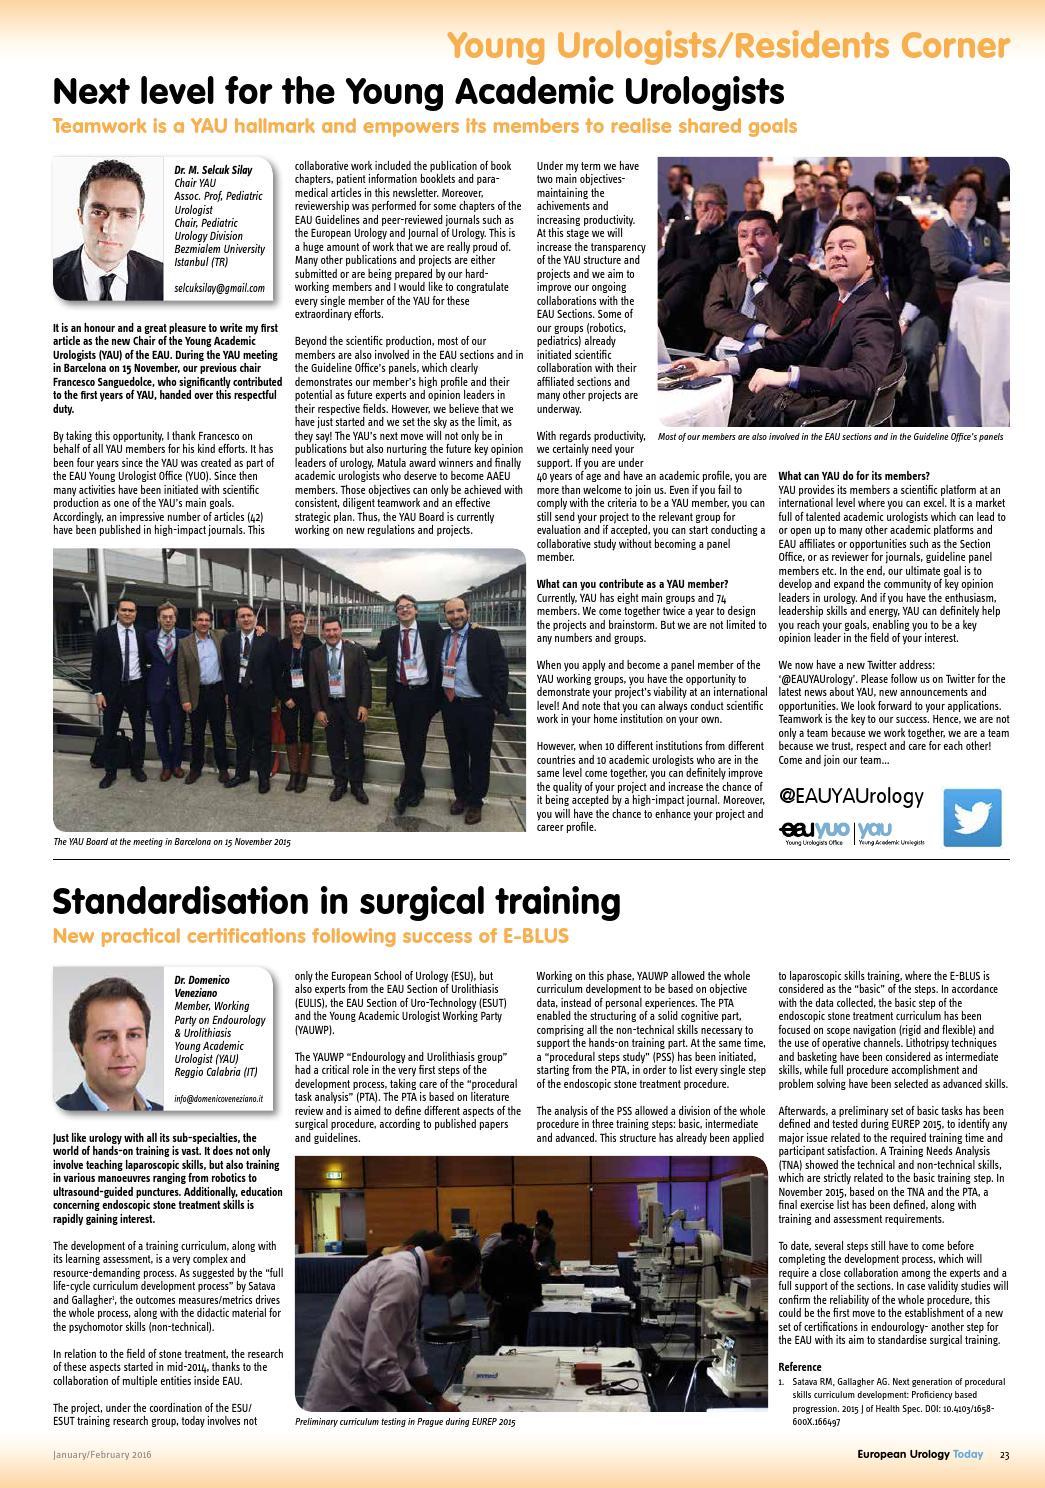 European Urology Today (EUT) Jan/Feb 2016